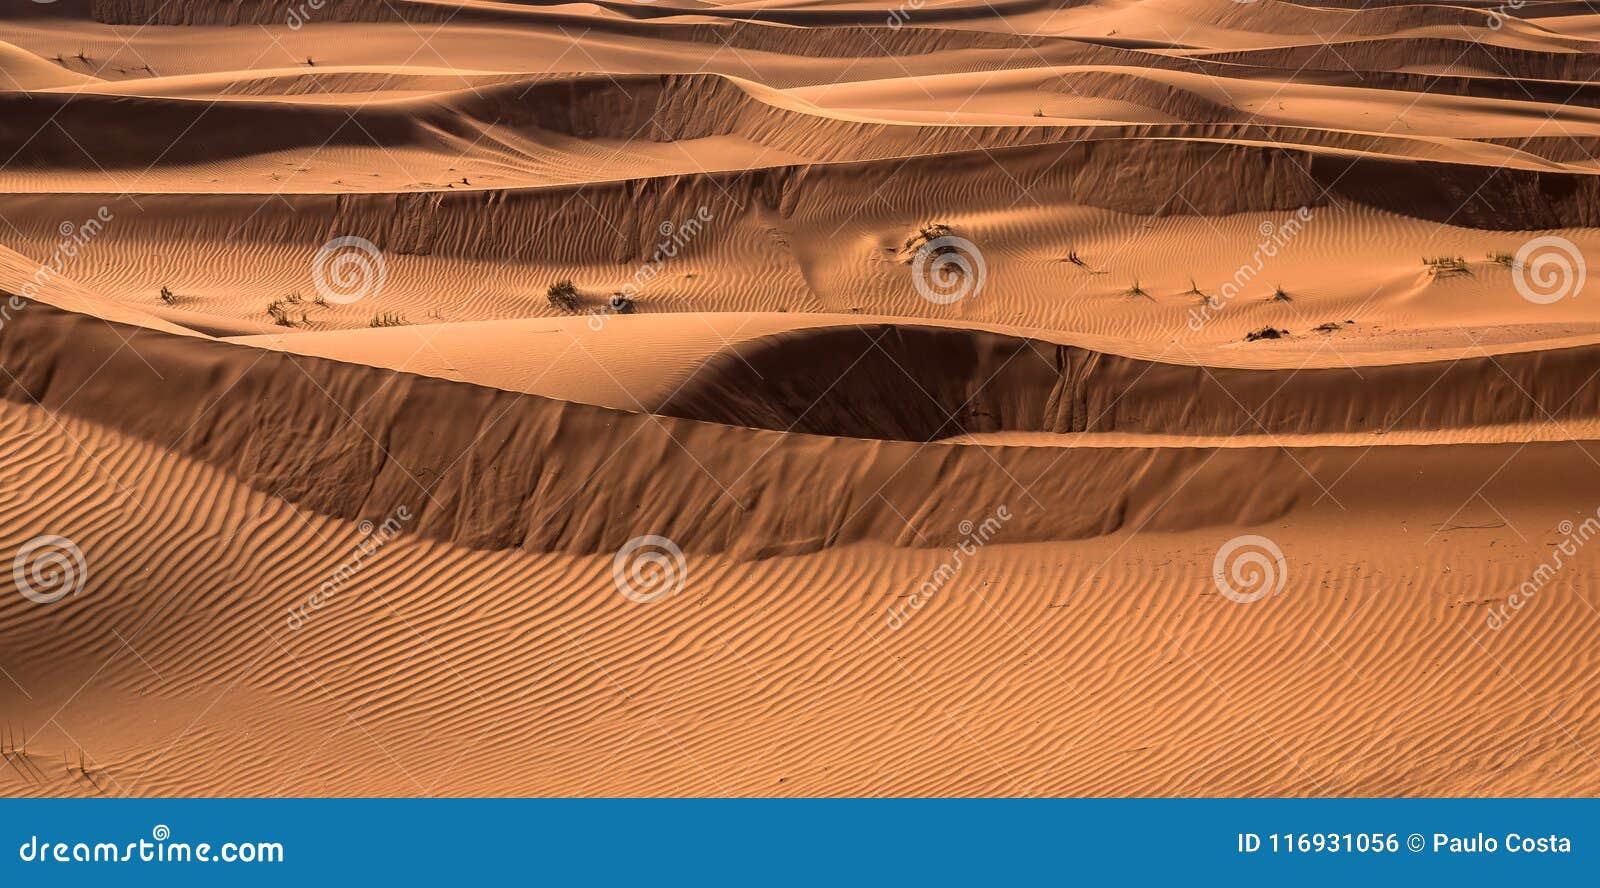 Desert sunset exposure near Dubai, United Arab Emirates